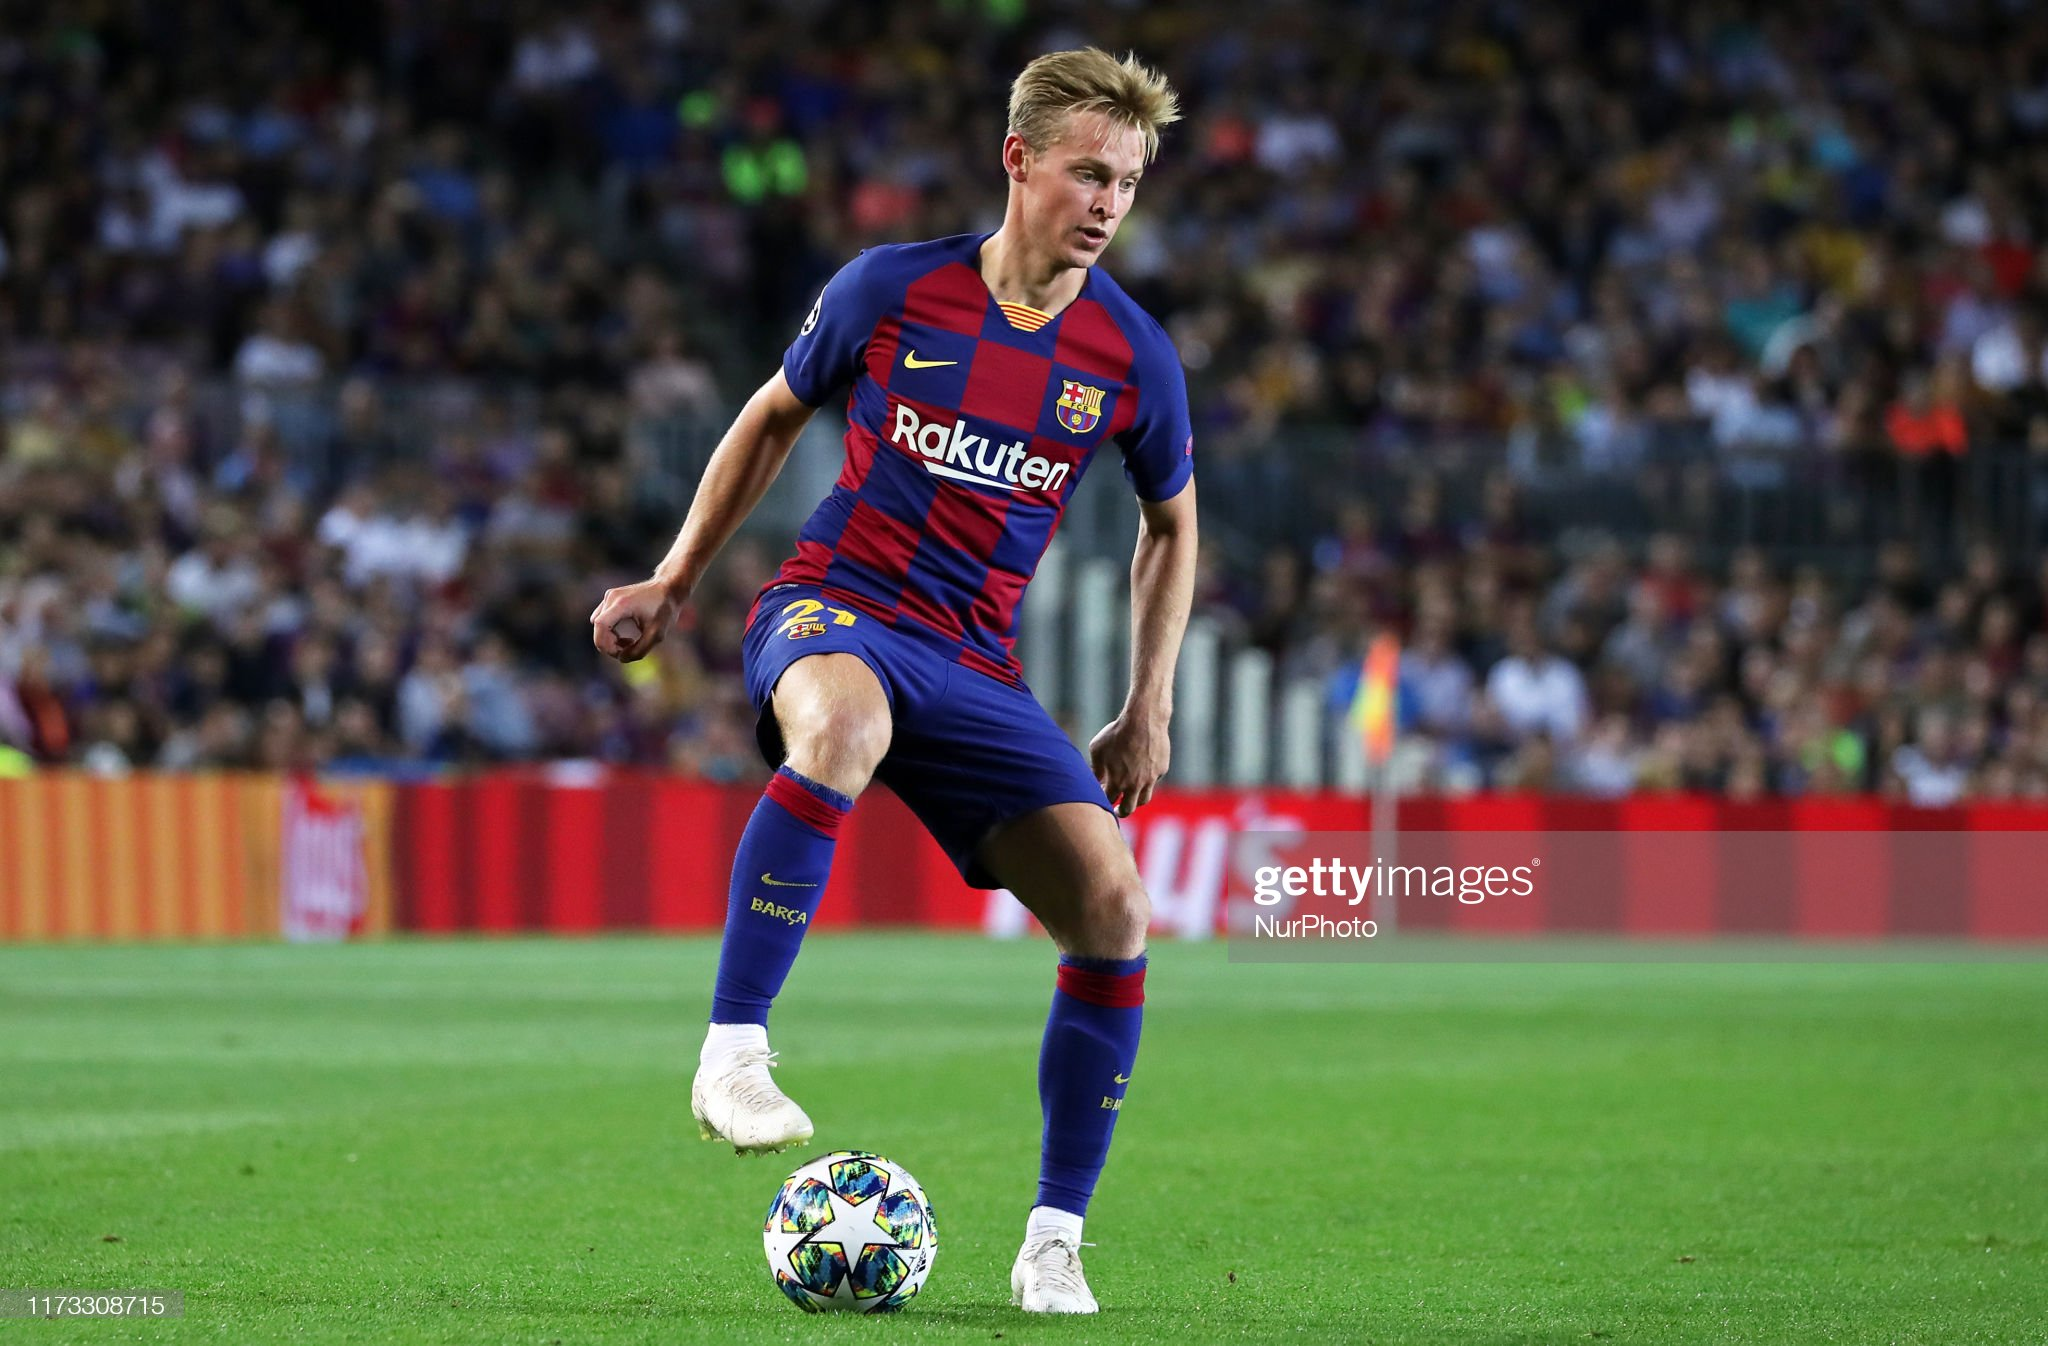 صور مباراة : برشلونة - إنتر 2-1 ( 02-10-2019 )  Frenkie-de-jong-during-the-match-between-fc-barcelona-between-inter-picture-id1173308715?s=2048x2048